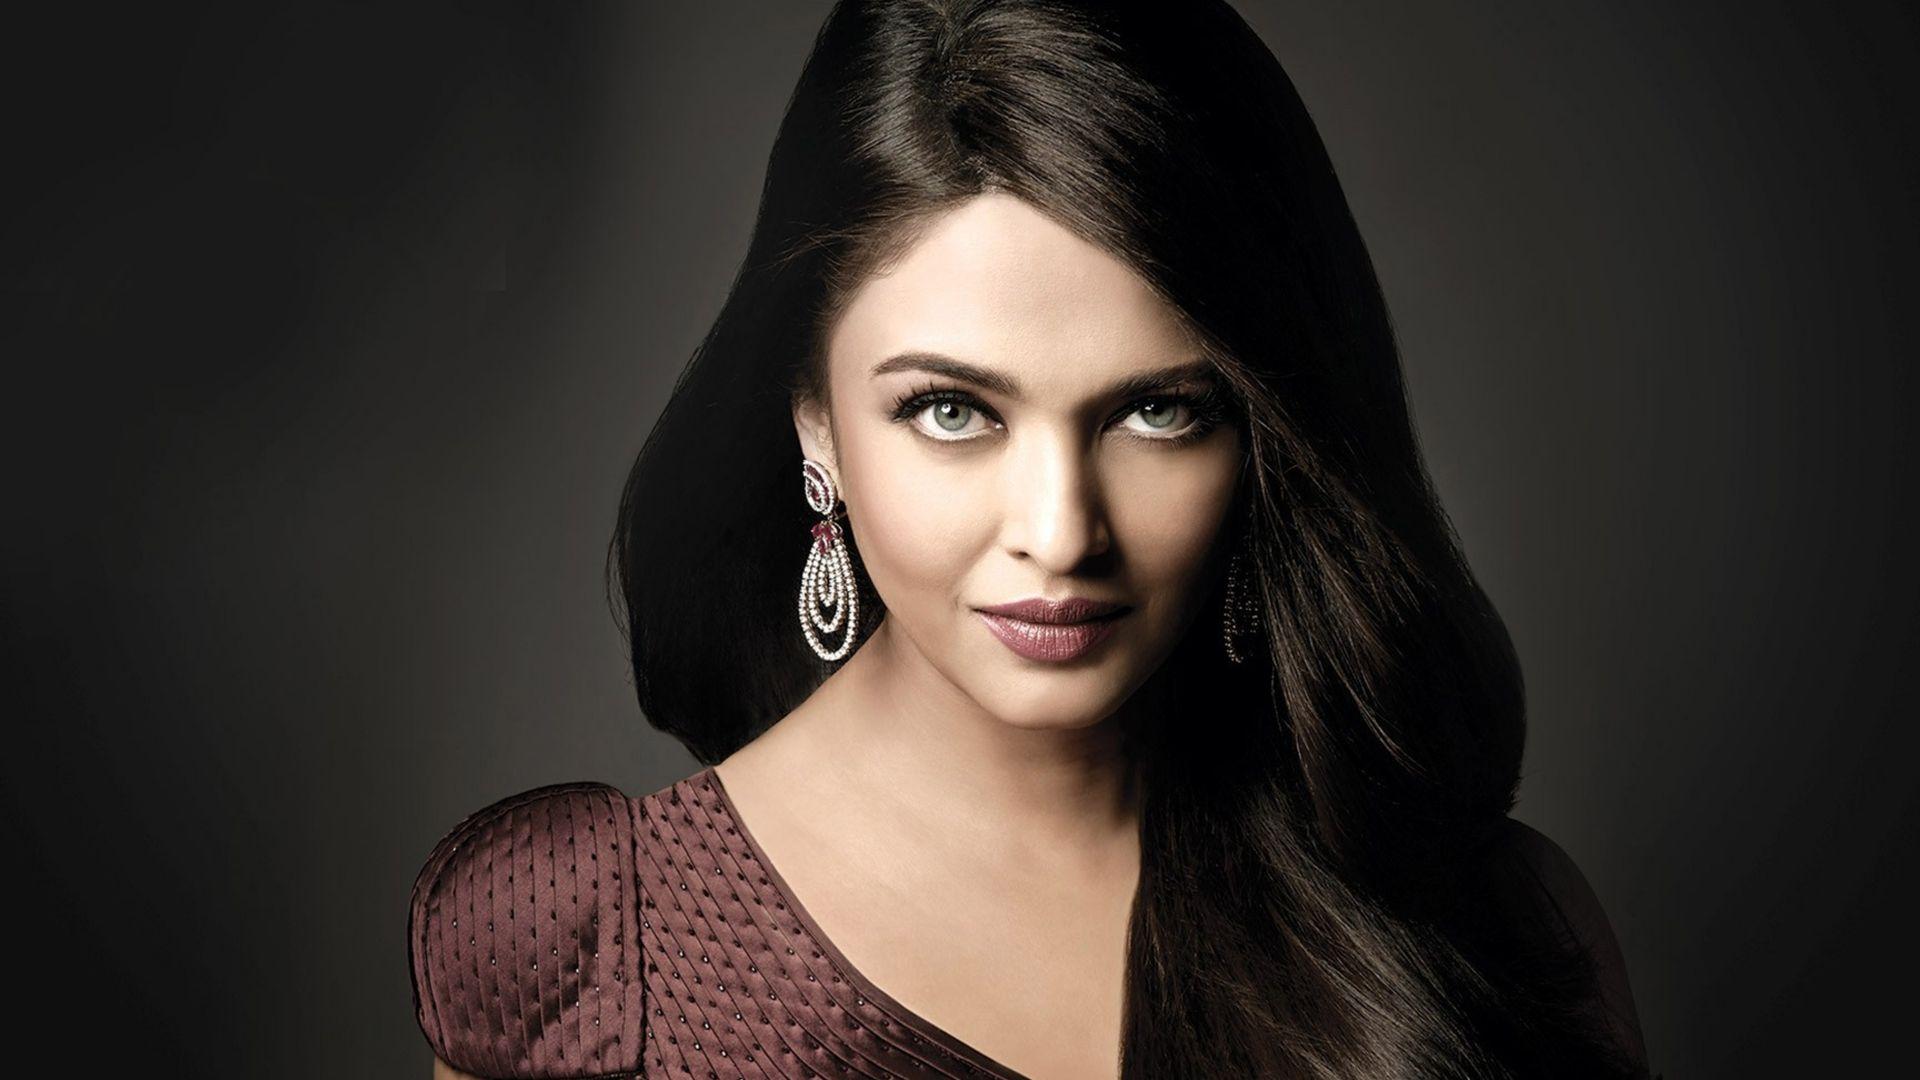 wallpaper aishwarya rai bachchan, 4k, photo, bollywood, celebrities